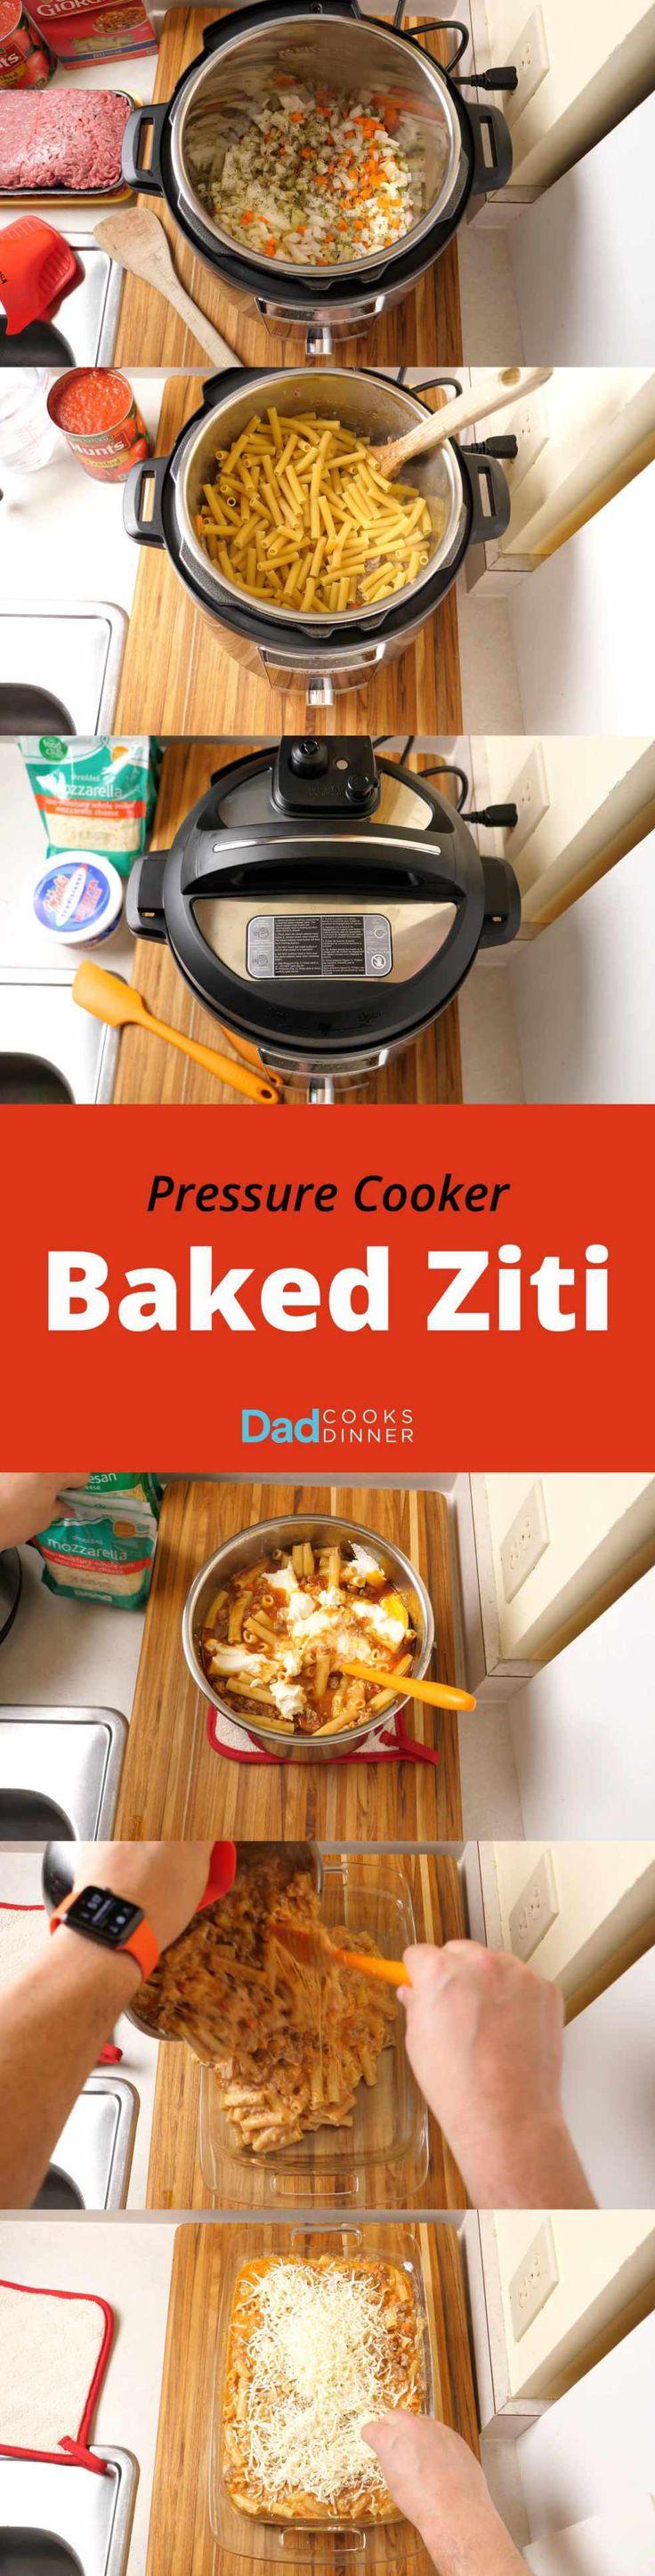 Pressure Cooker Baked Ziti - Step by Step Tower | DadCooksDinner.com